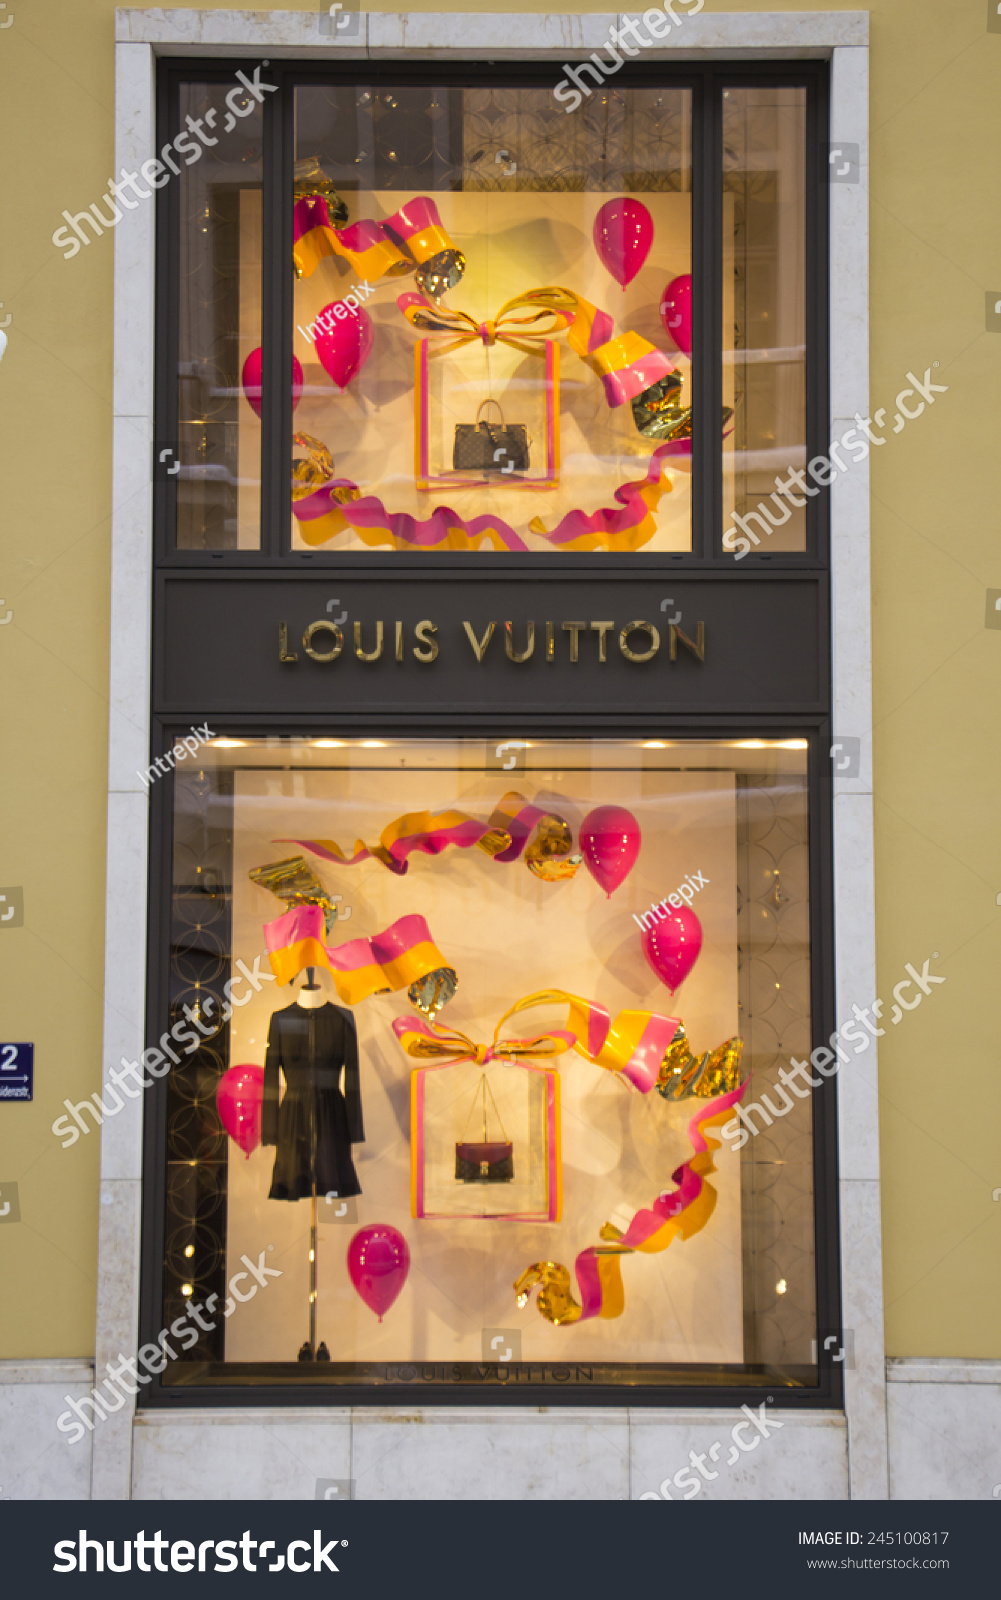 5ab842e2f68d0 MUNICH - DEC 31  Shop windows are decorated at the Louis Vuitton store in  Munich